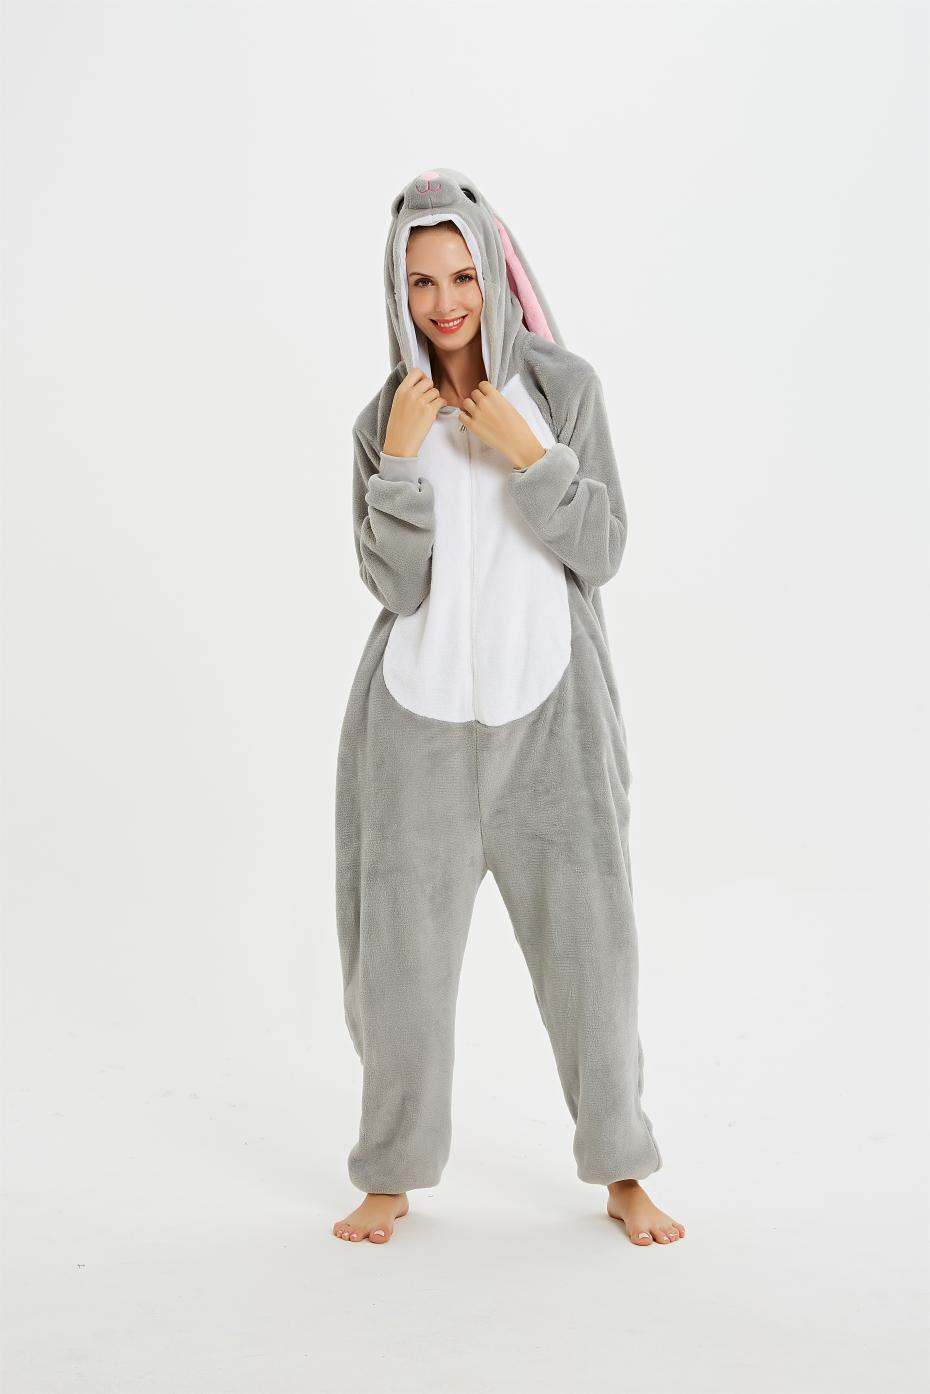 Image 5 - Adult Animal Pajamas Long Sleeve Sleepwear kigurumi All in One Pyjama Animal Suits Rabbit Garments Women Animal Cartoon Onesies-in Pajama Sets from Underwear & Sleepwears